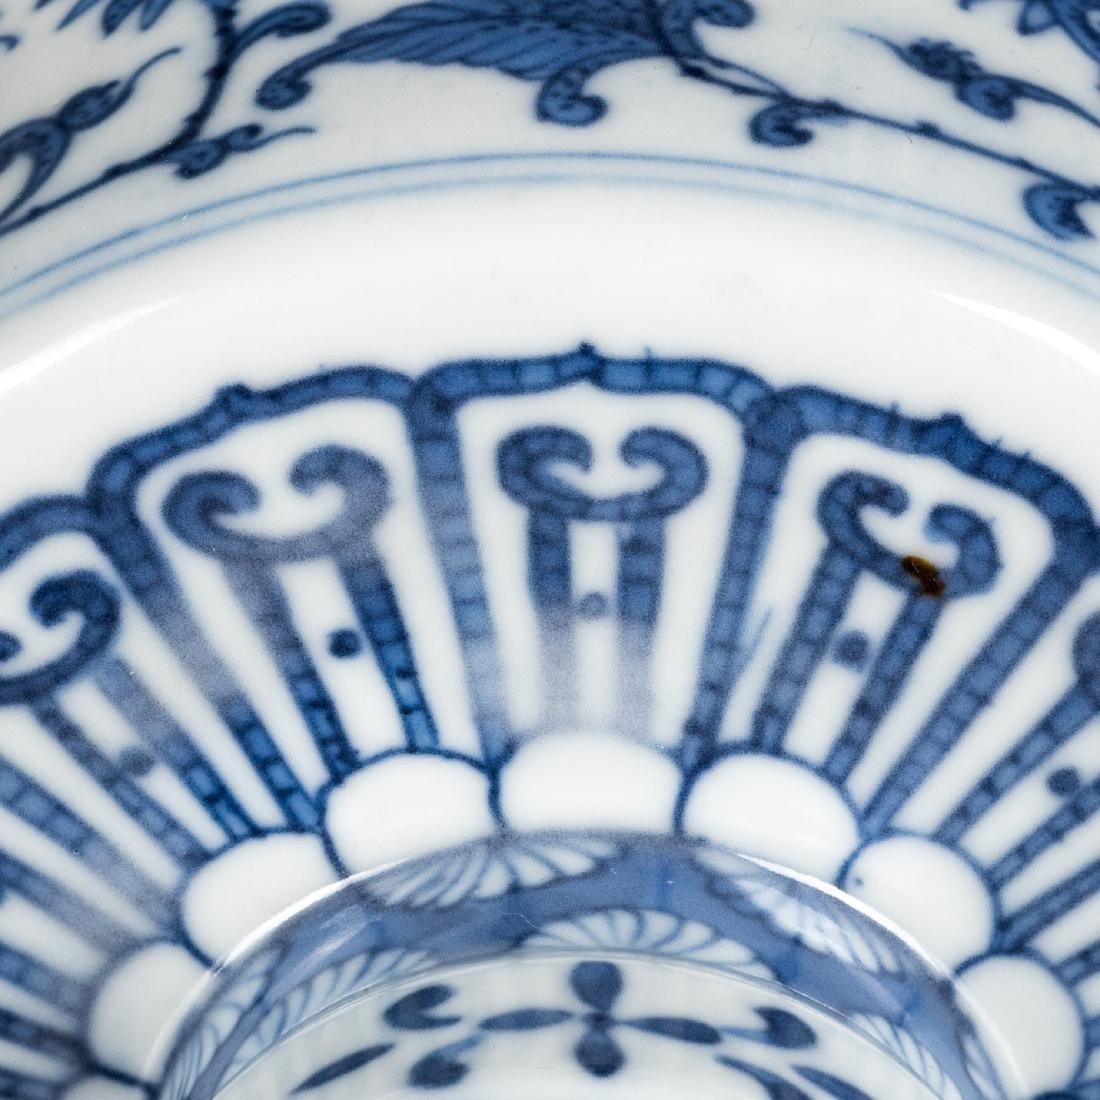 Qianlong Mark Blue & White Stem Cup - 6